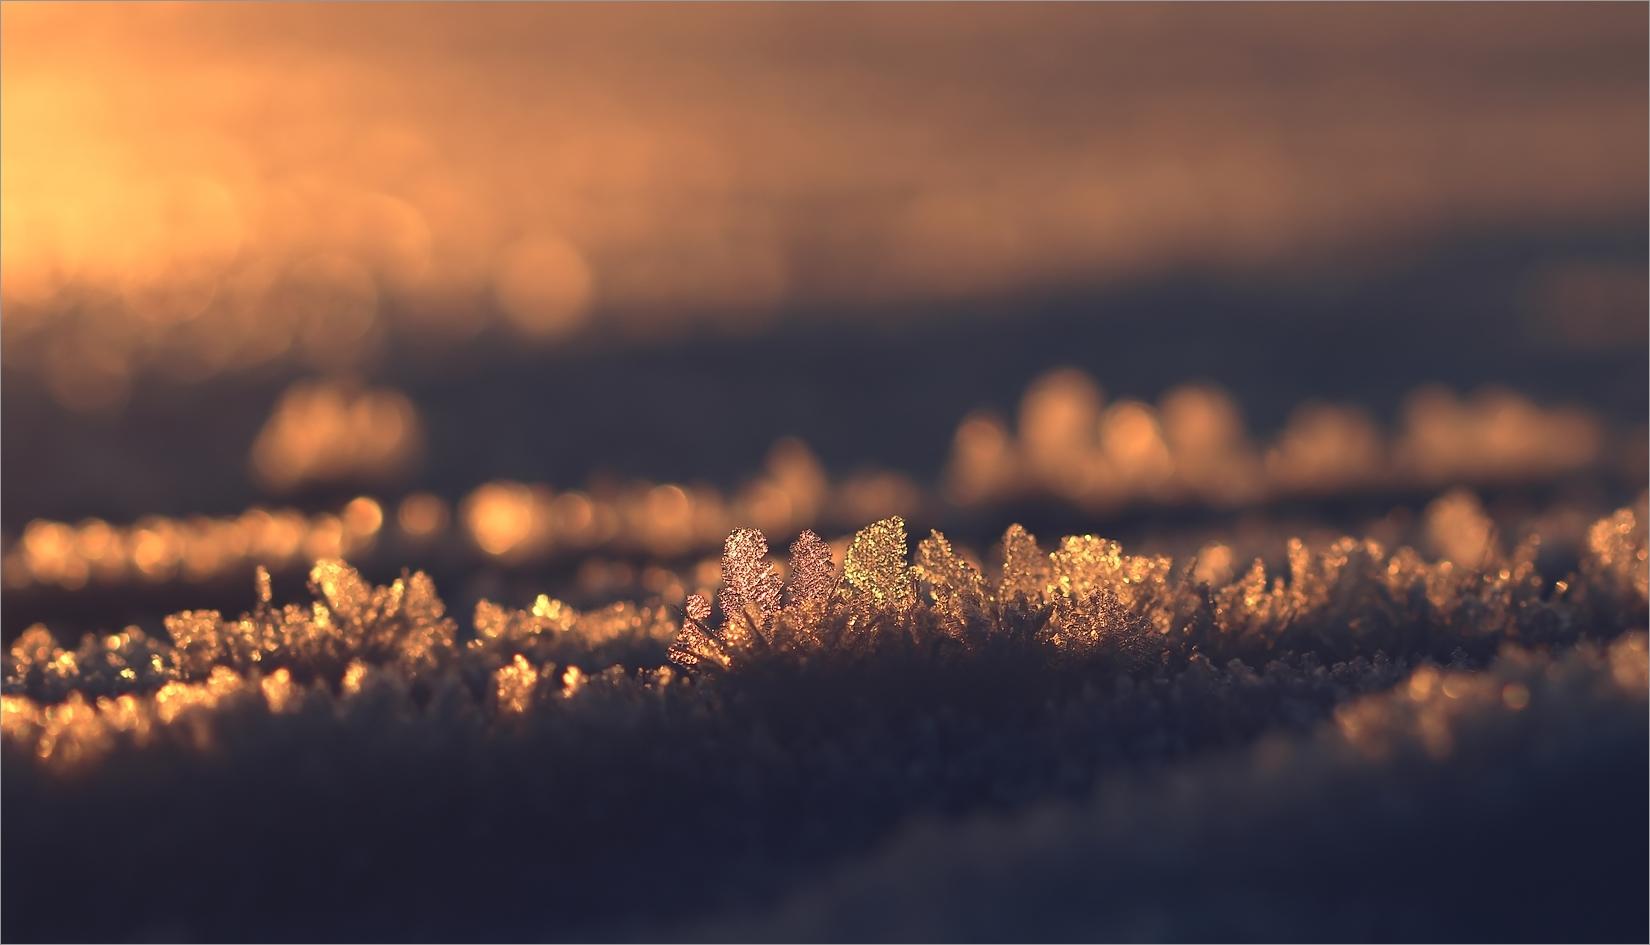 Eisige Welt